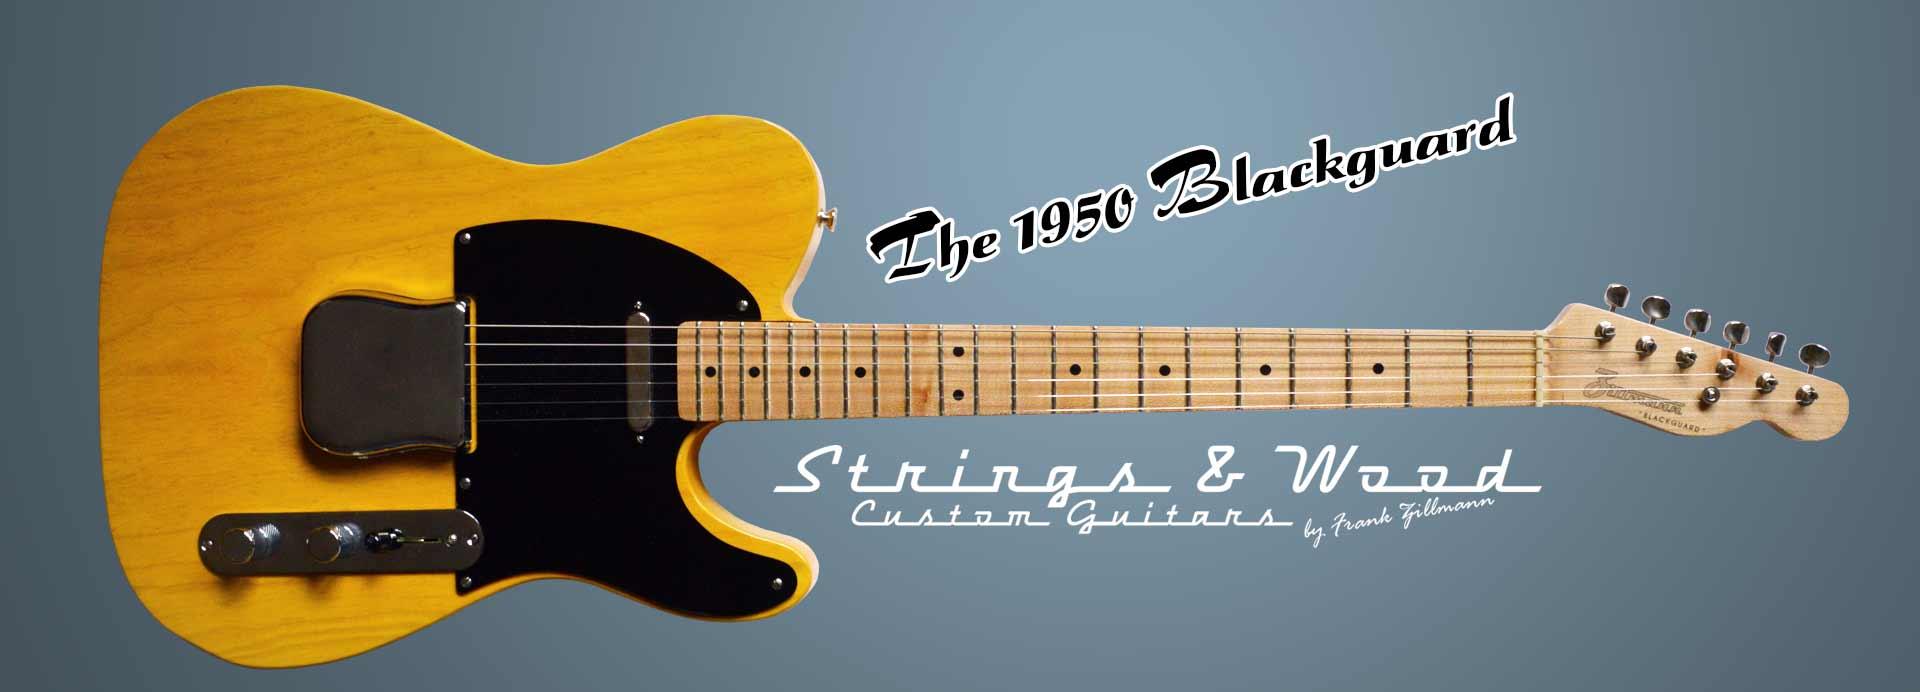 vintage correct 1950 Blackguard